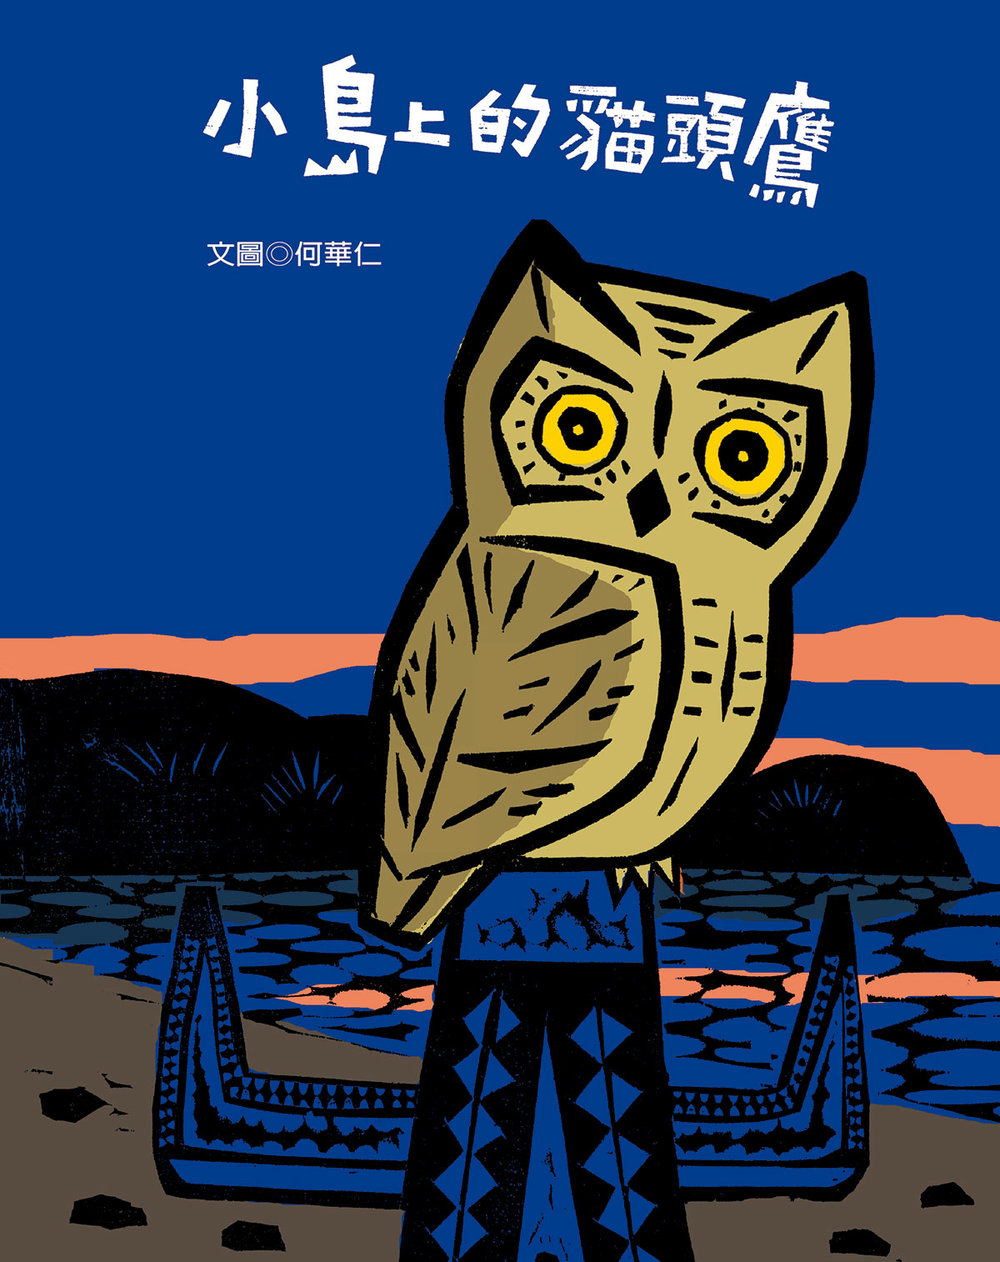 Children's Publications Co., Ltd.|青林國際出版(股)公司   40pages|21 x 28cm|978-9867635396   CONTACT INFO:   Susan Yang Managing Editor|susan@012book.com.tw  Tel:+886-2-87972777 ext.511